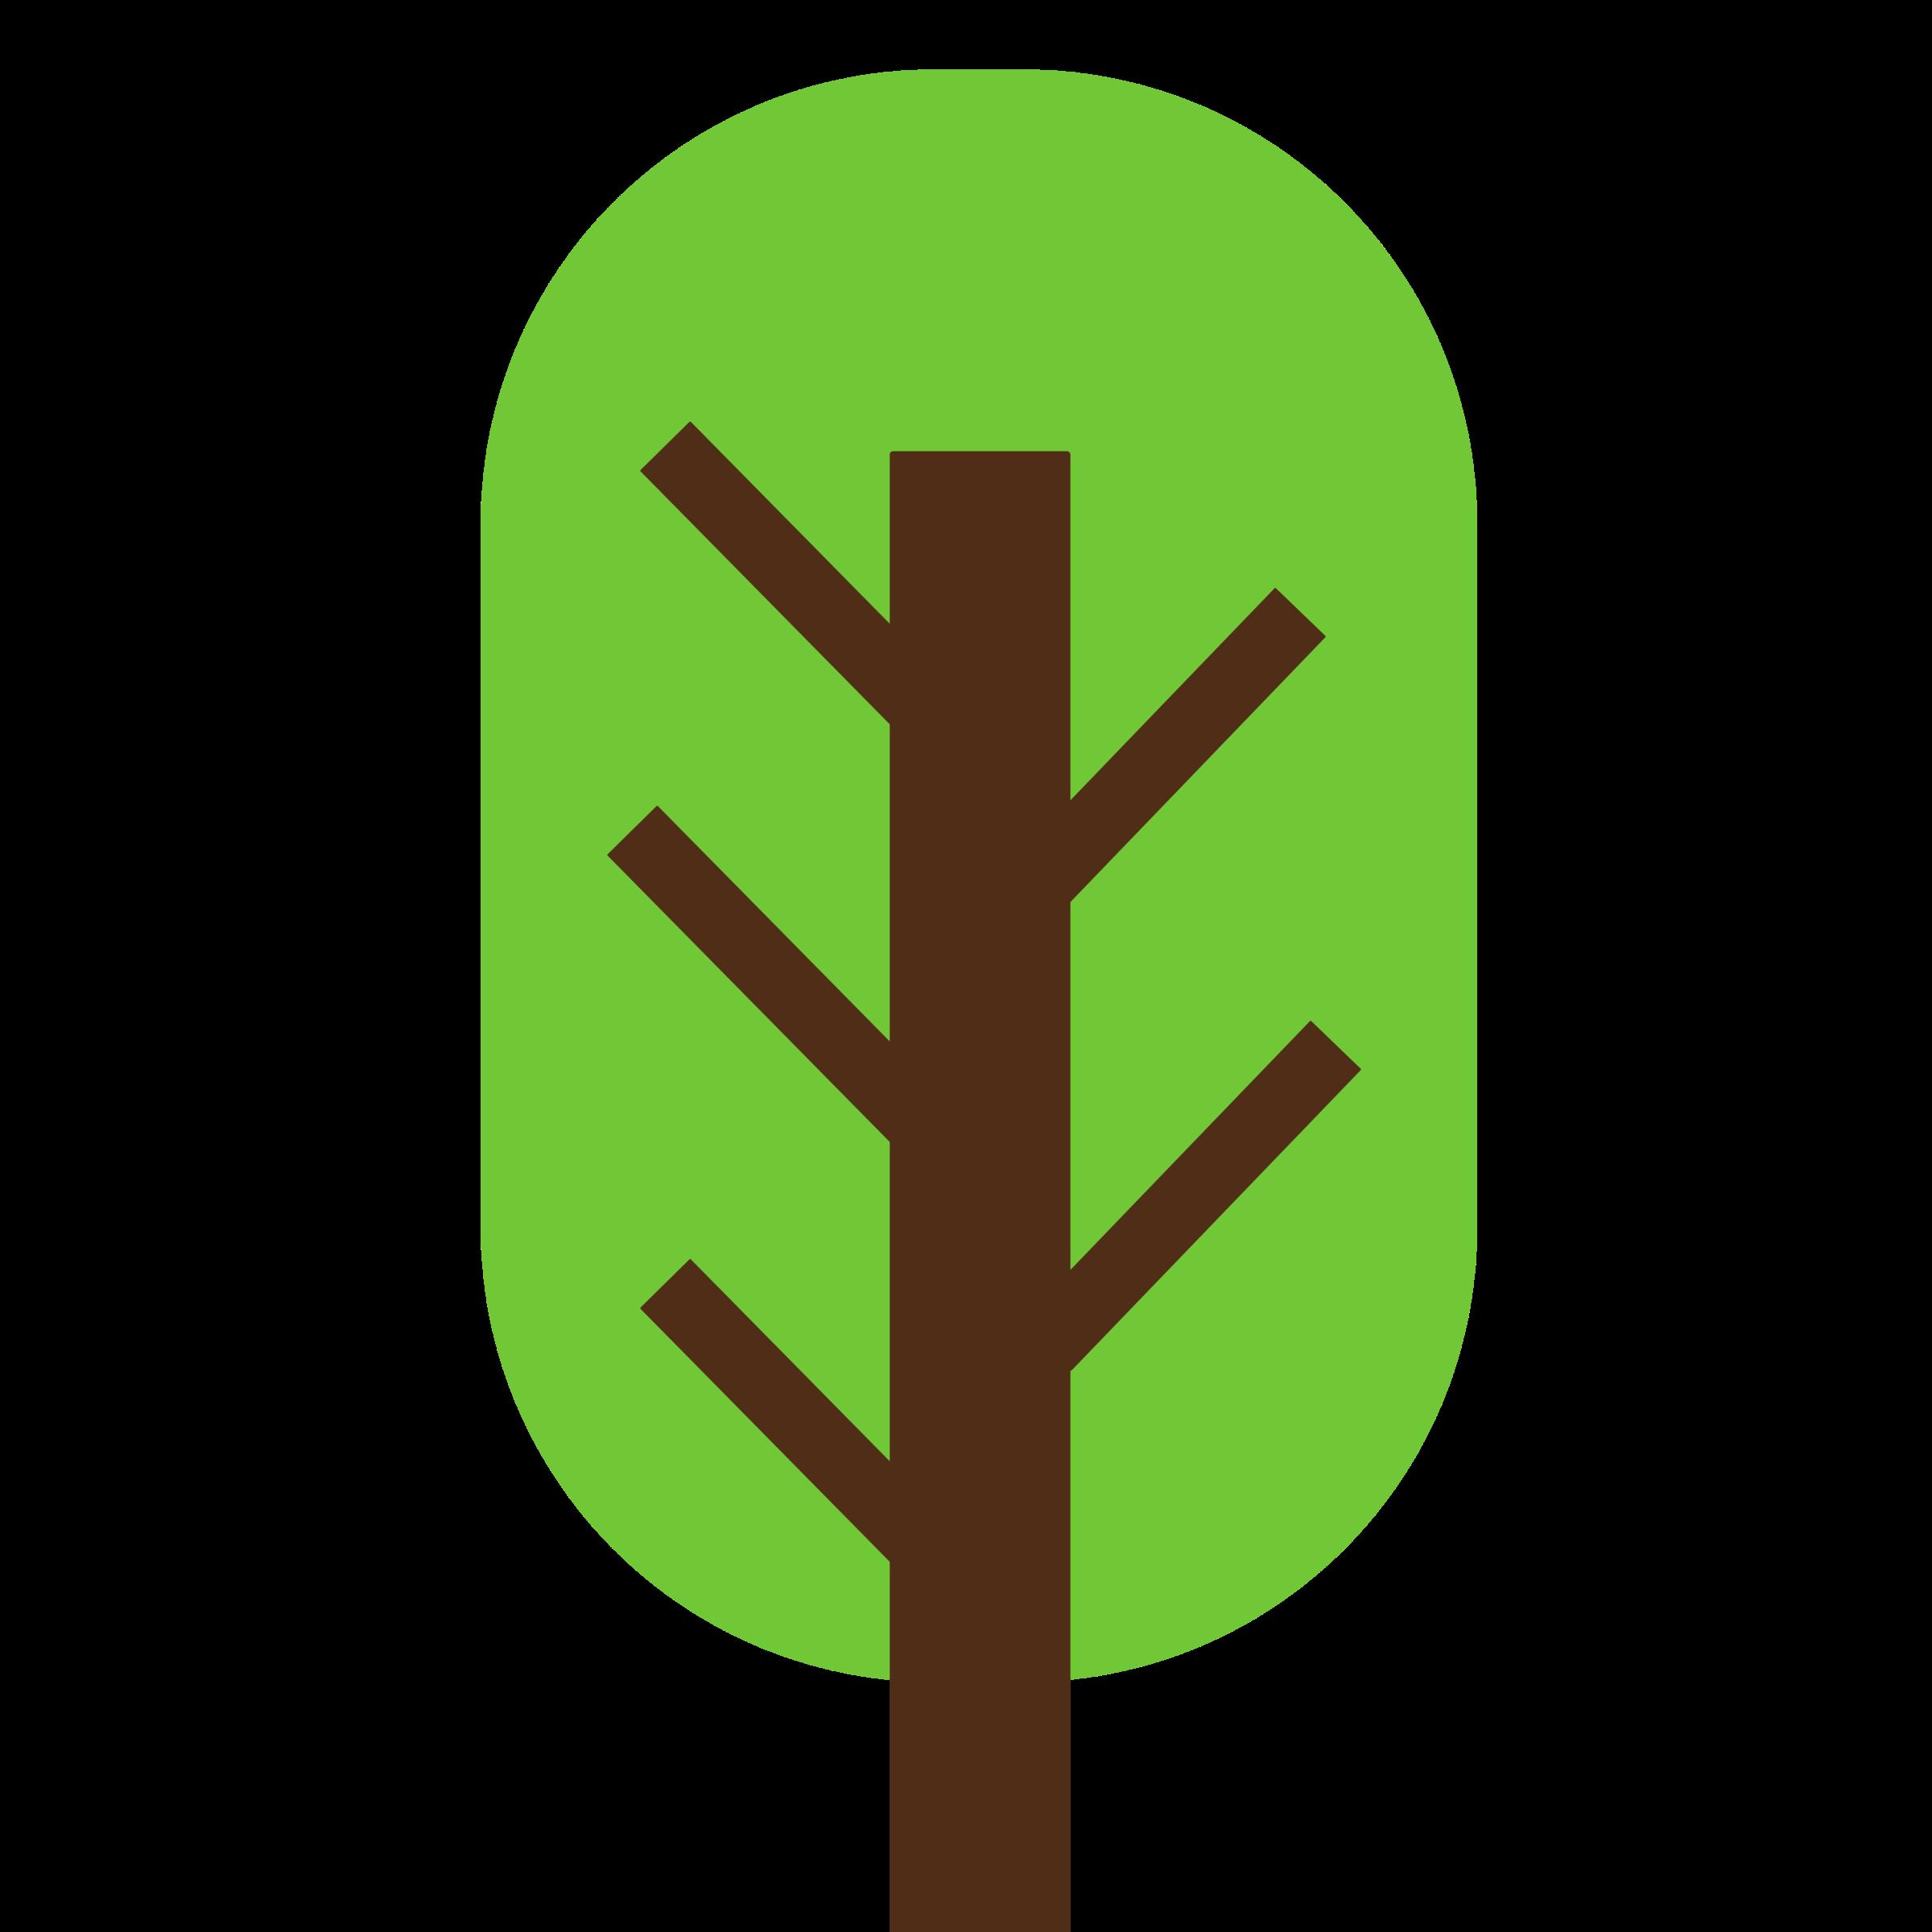 Tree logo clipart clipart transparent stock Clipart - Square Tree- 2-color- squarish and geometric. clipart transparent stock